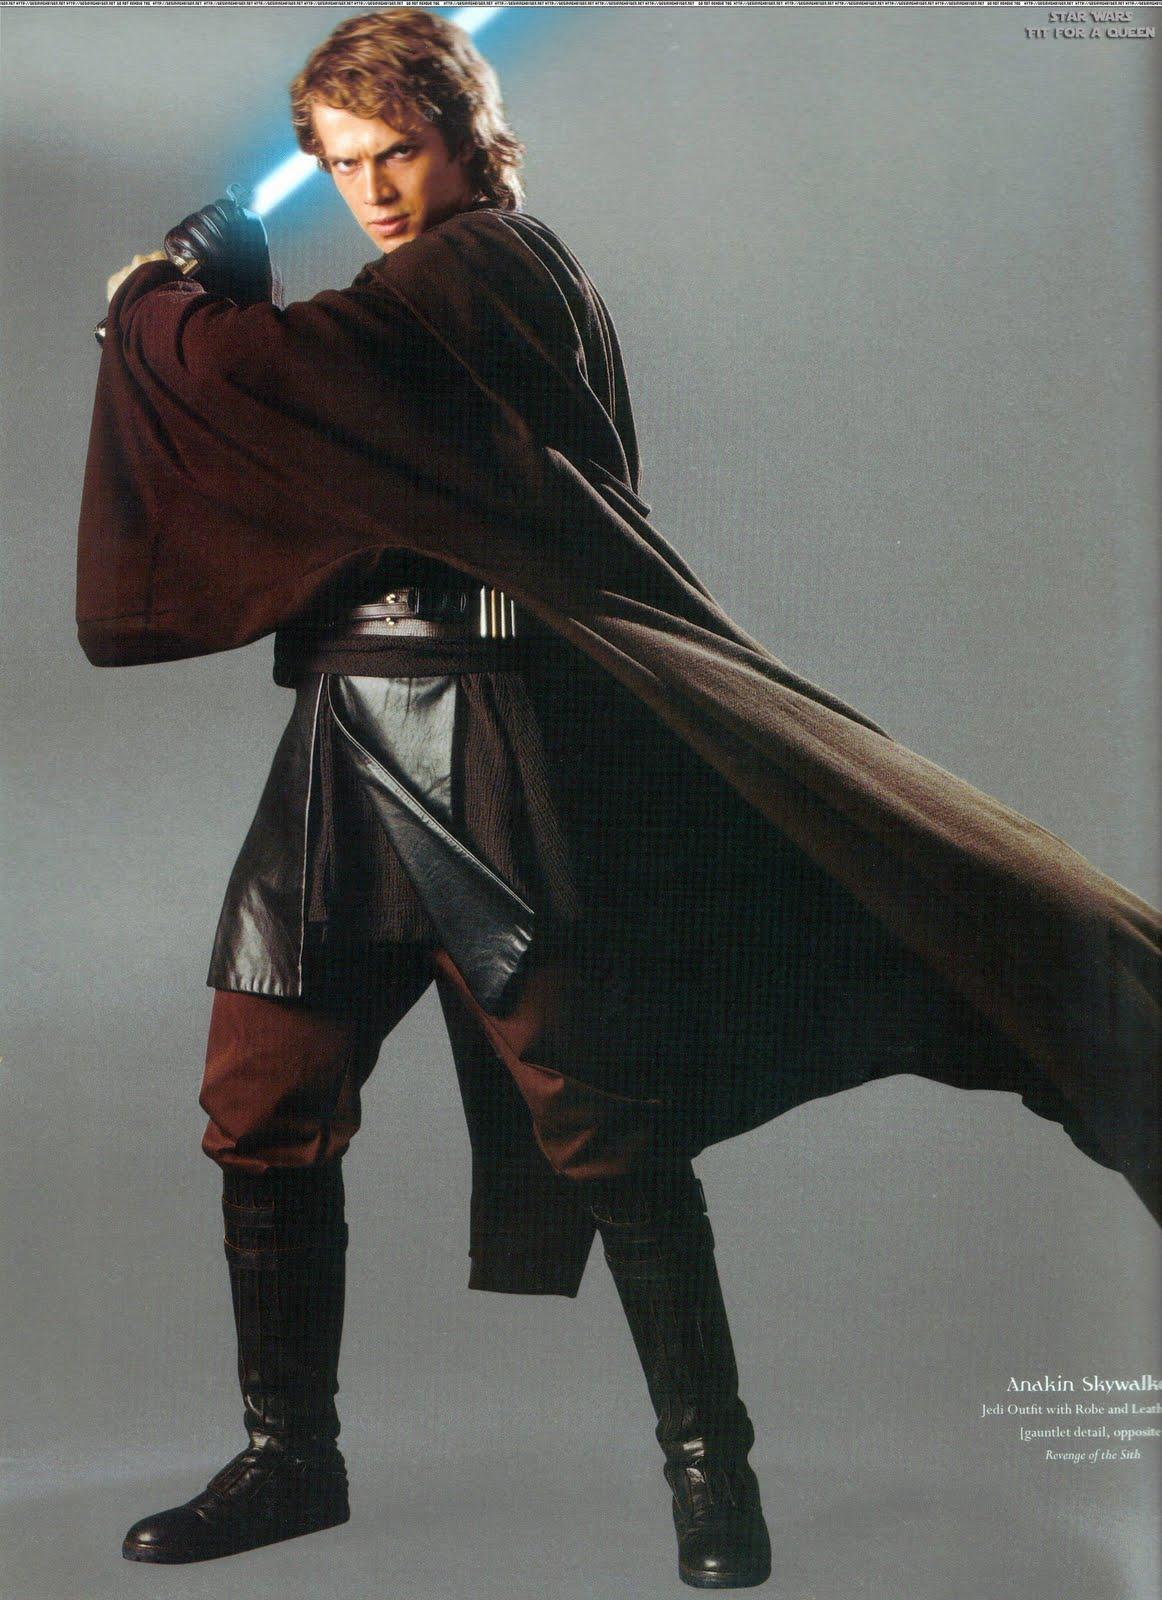 Star Wars episode 3 anakin skywalker wallpaper | Picture ...